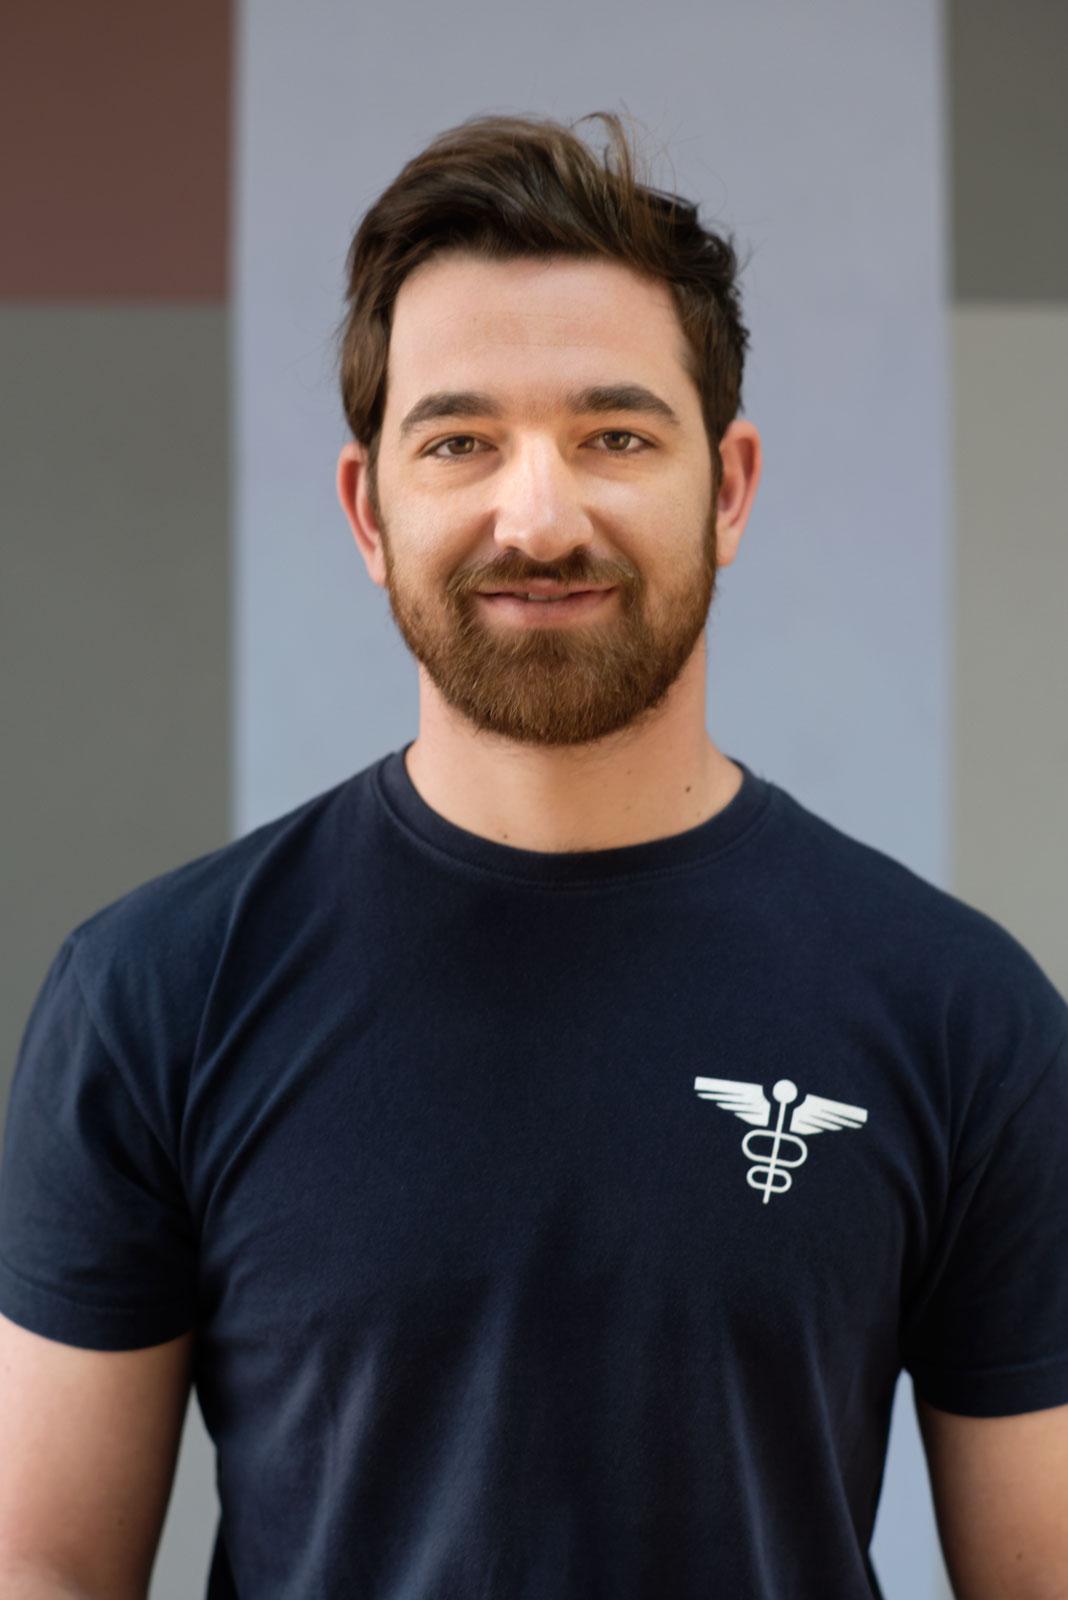 Therapy Lab - Δημήτρης Μπερτόλης - Φυσιοθεραπευτής